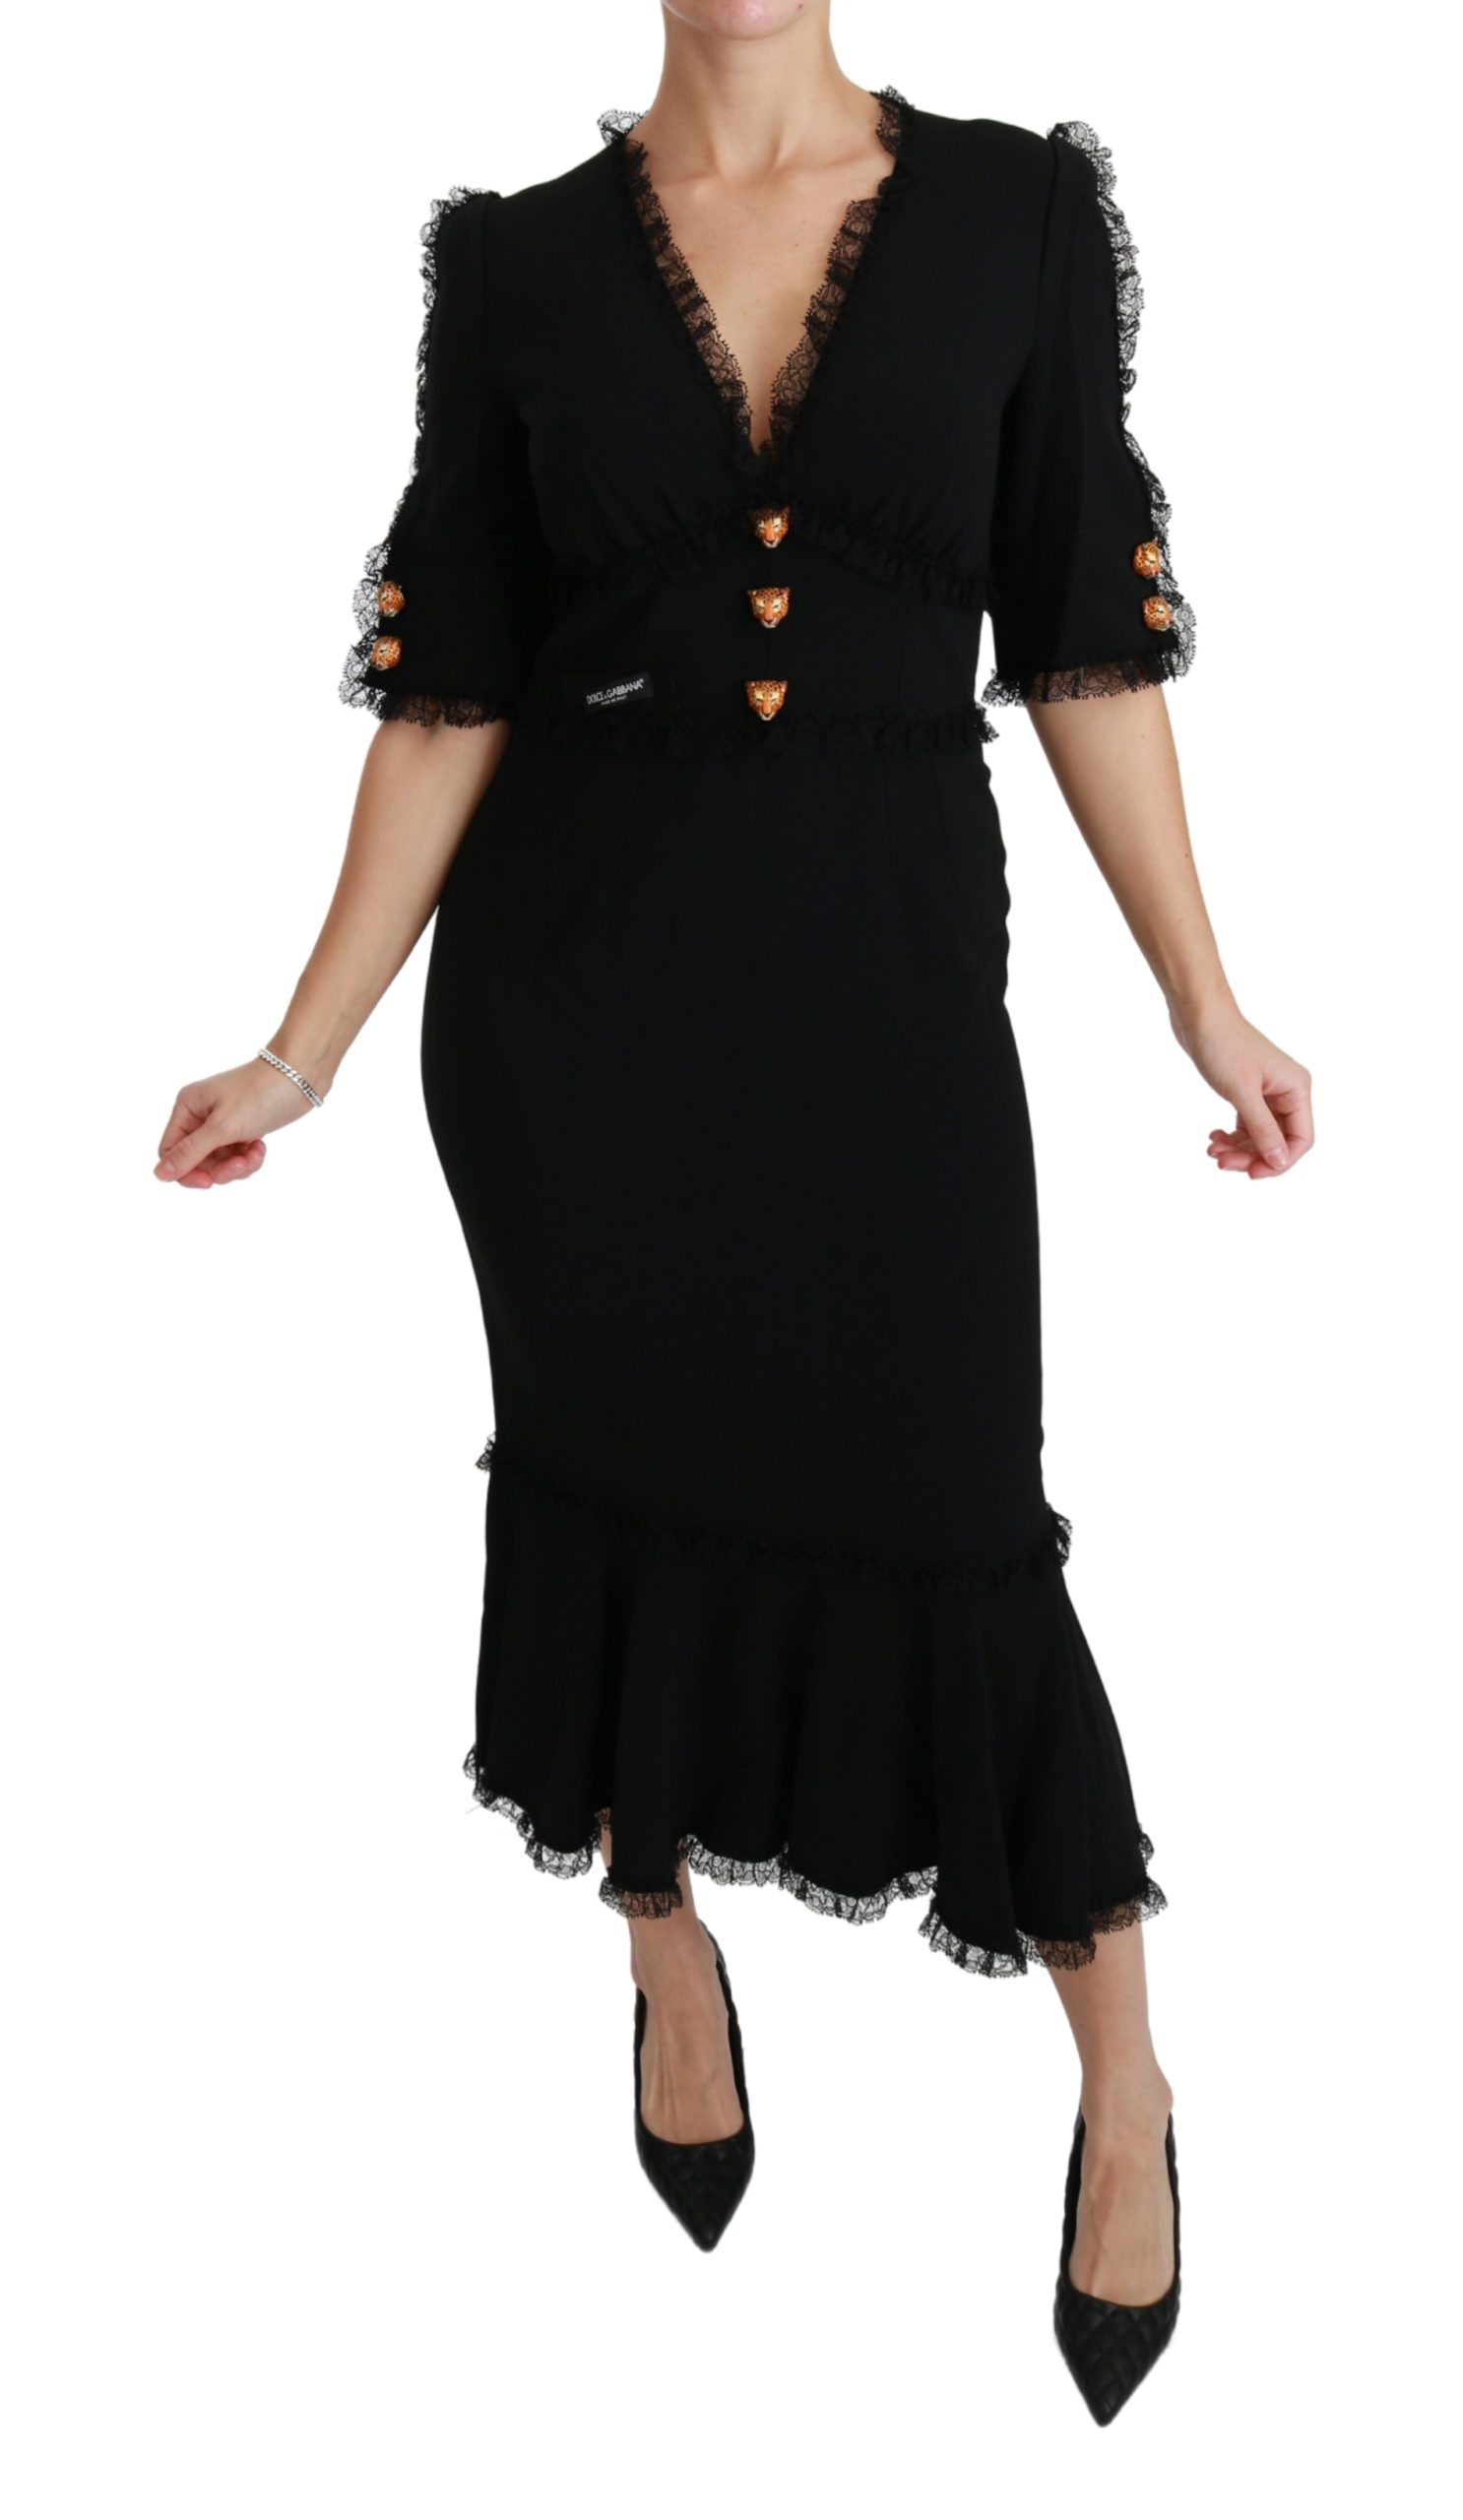 Dolce & Gabbana Women's Lace Shift Leopard Head Dress Black DR2470 - IT44|L